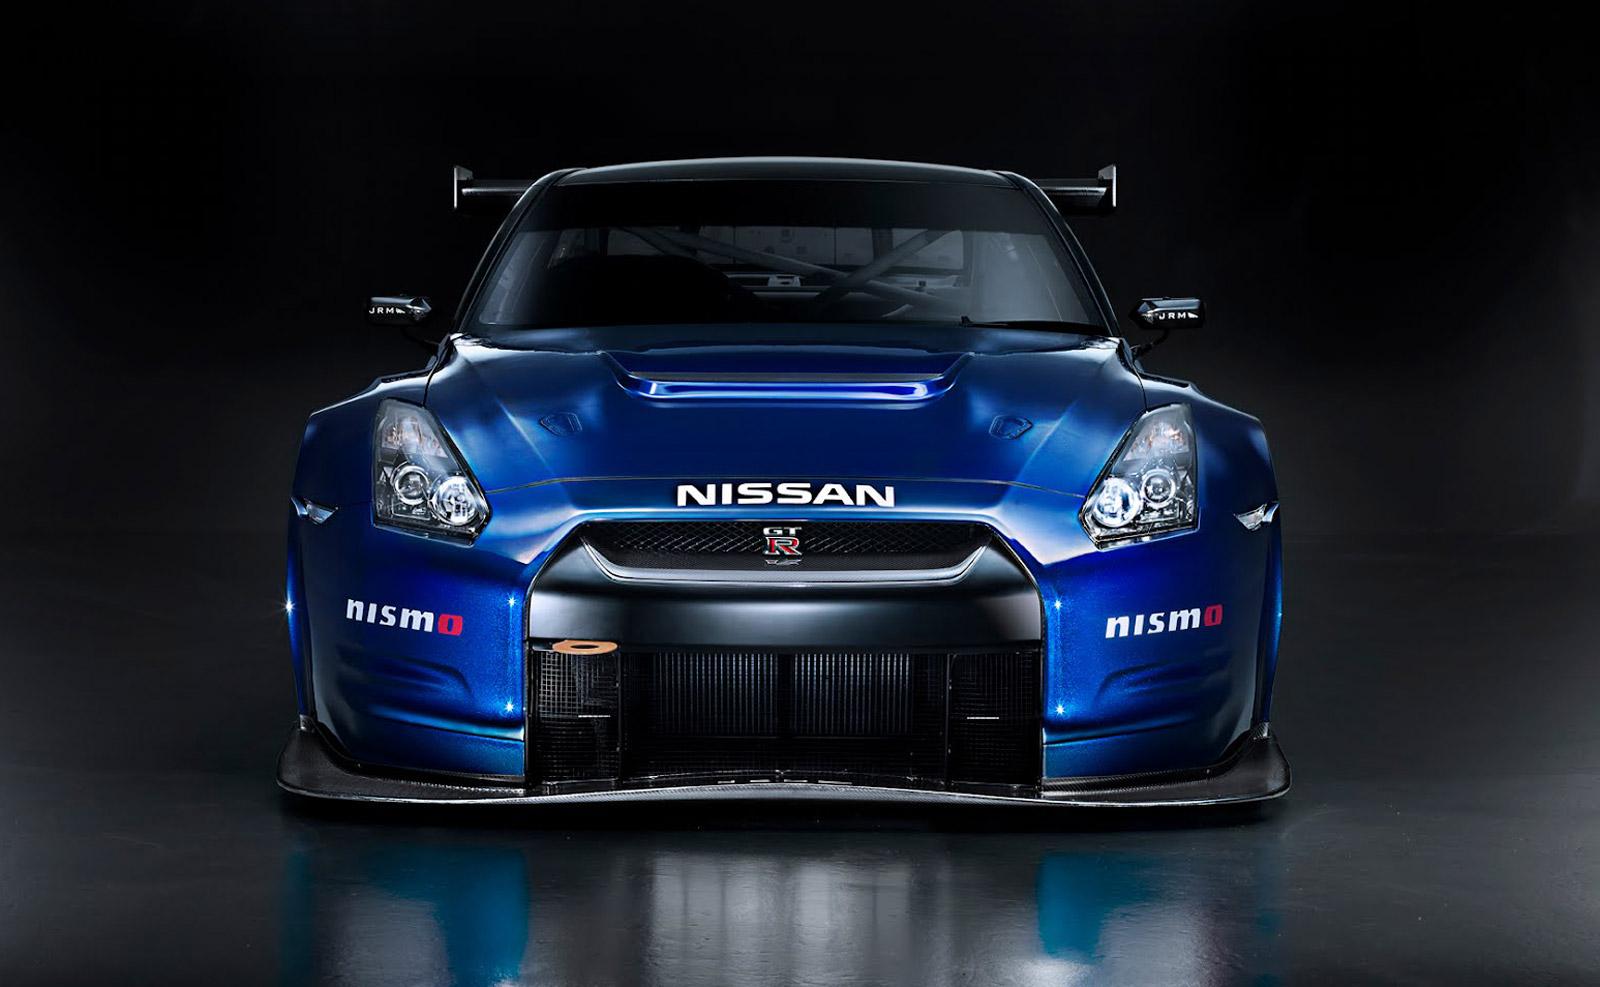 Twin-Turbo Ford GT, 2012 Nissan GT-R Nismo GT3, Dodge Dart ...